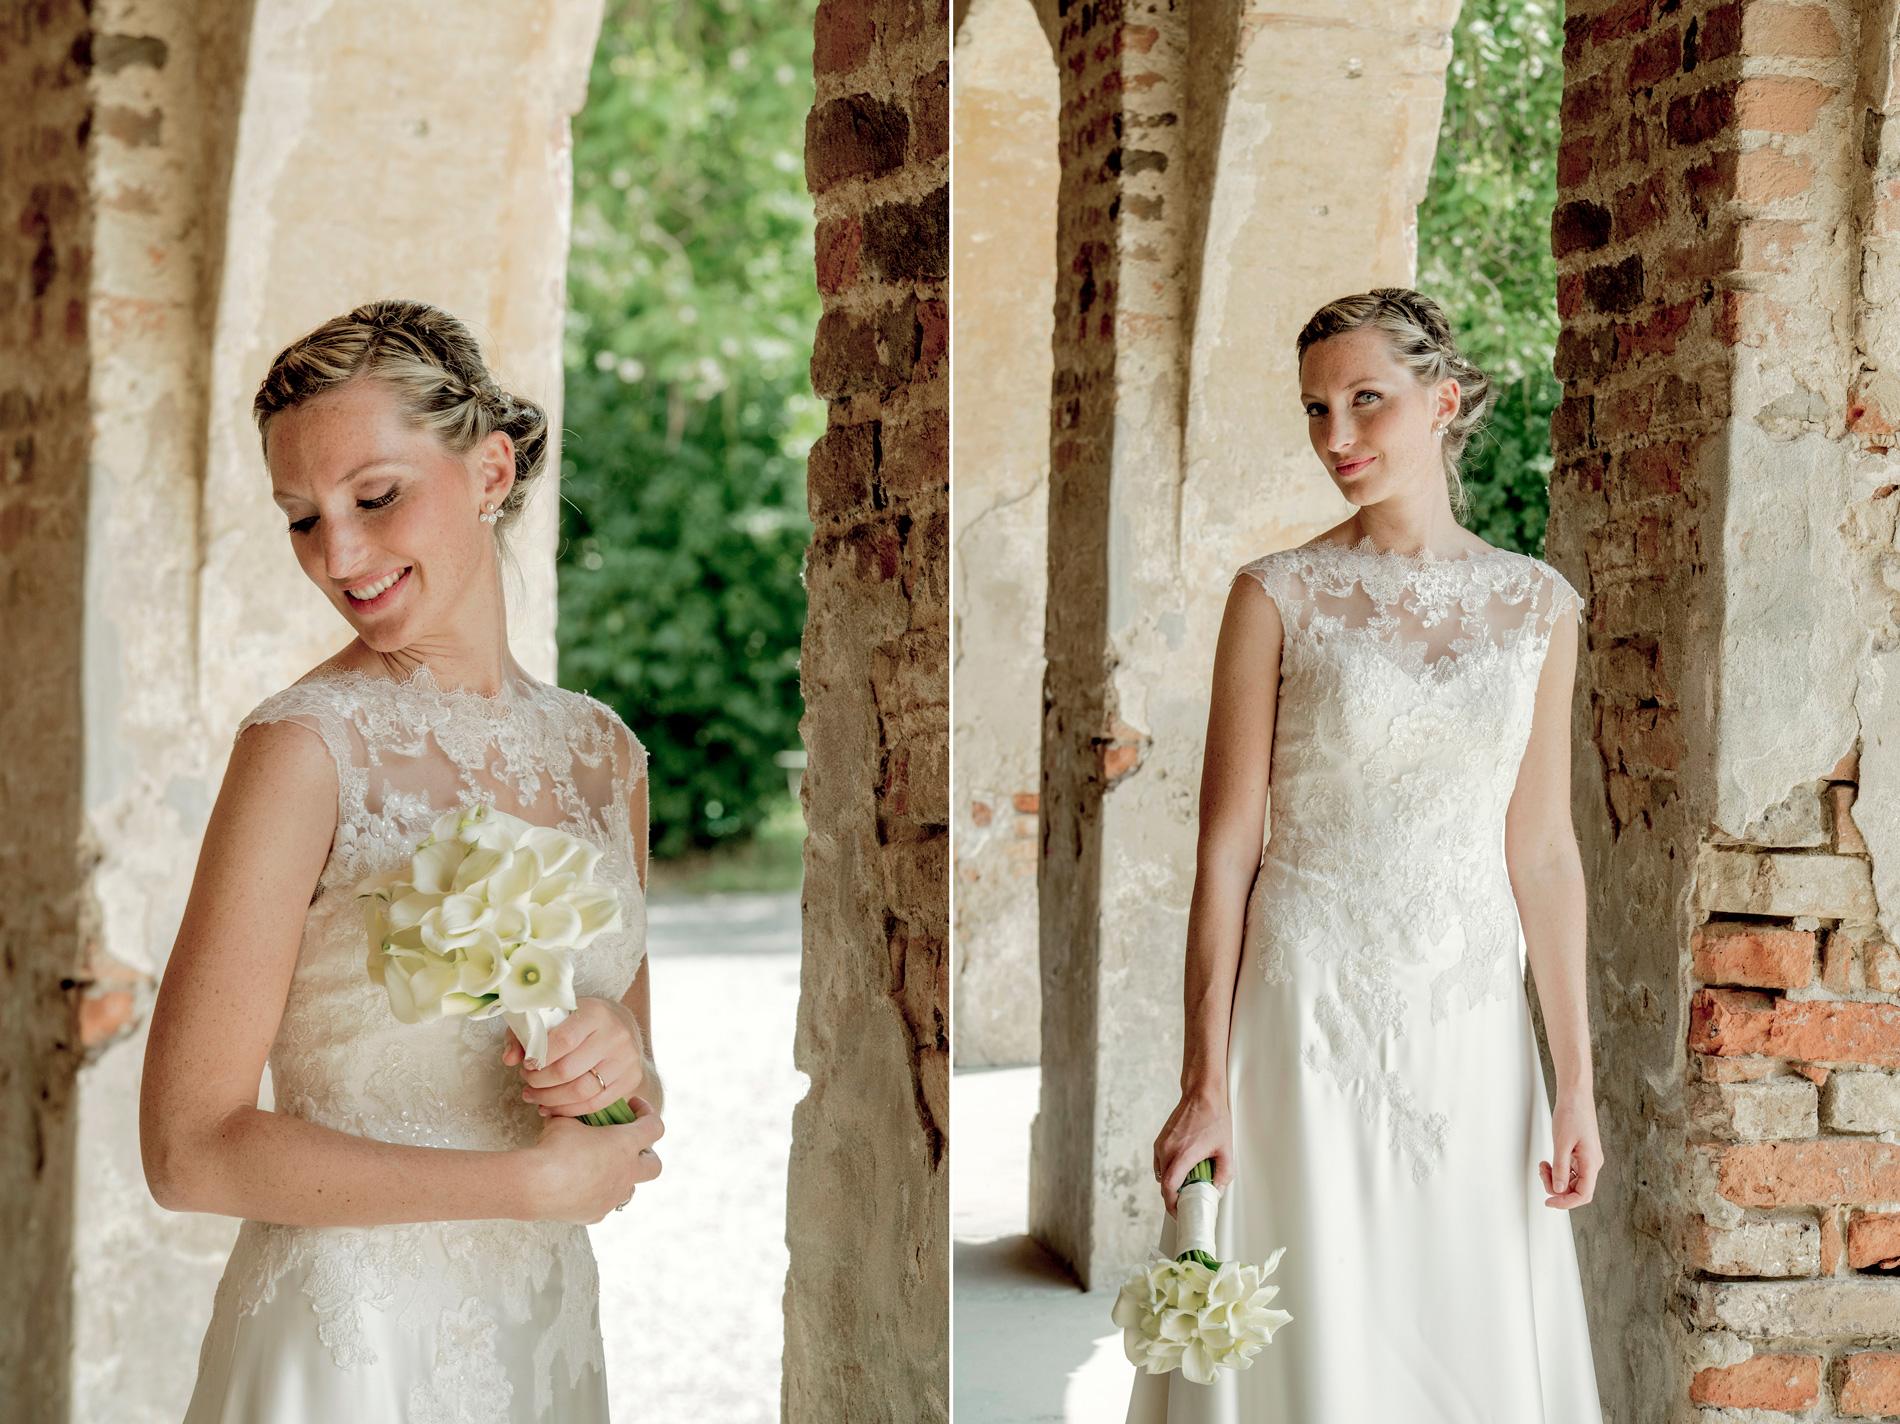 ivano-di-maria-wedding-photographer-nicole-stef-9